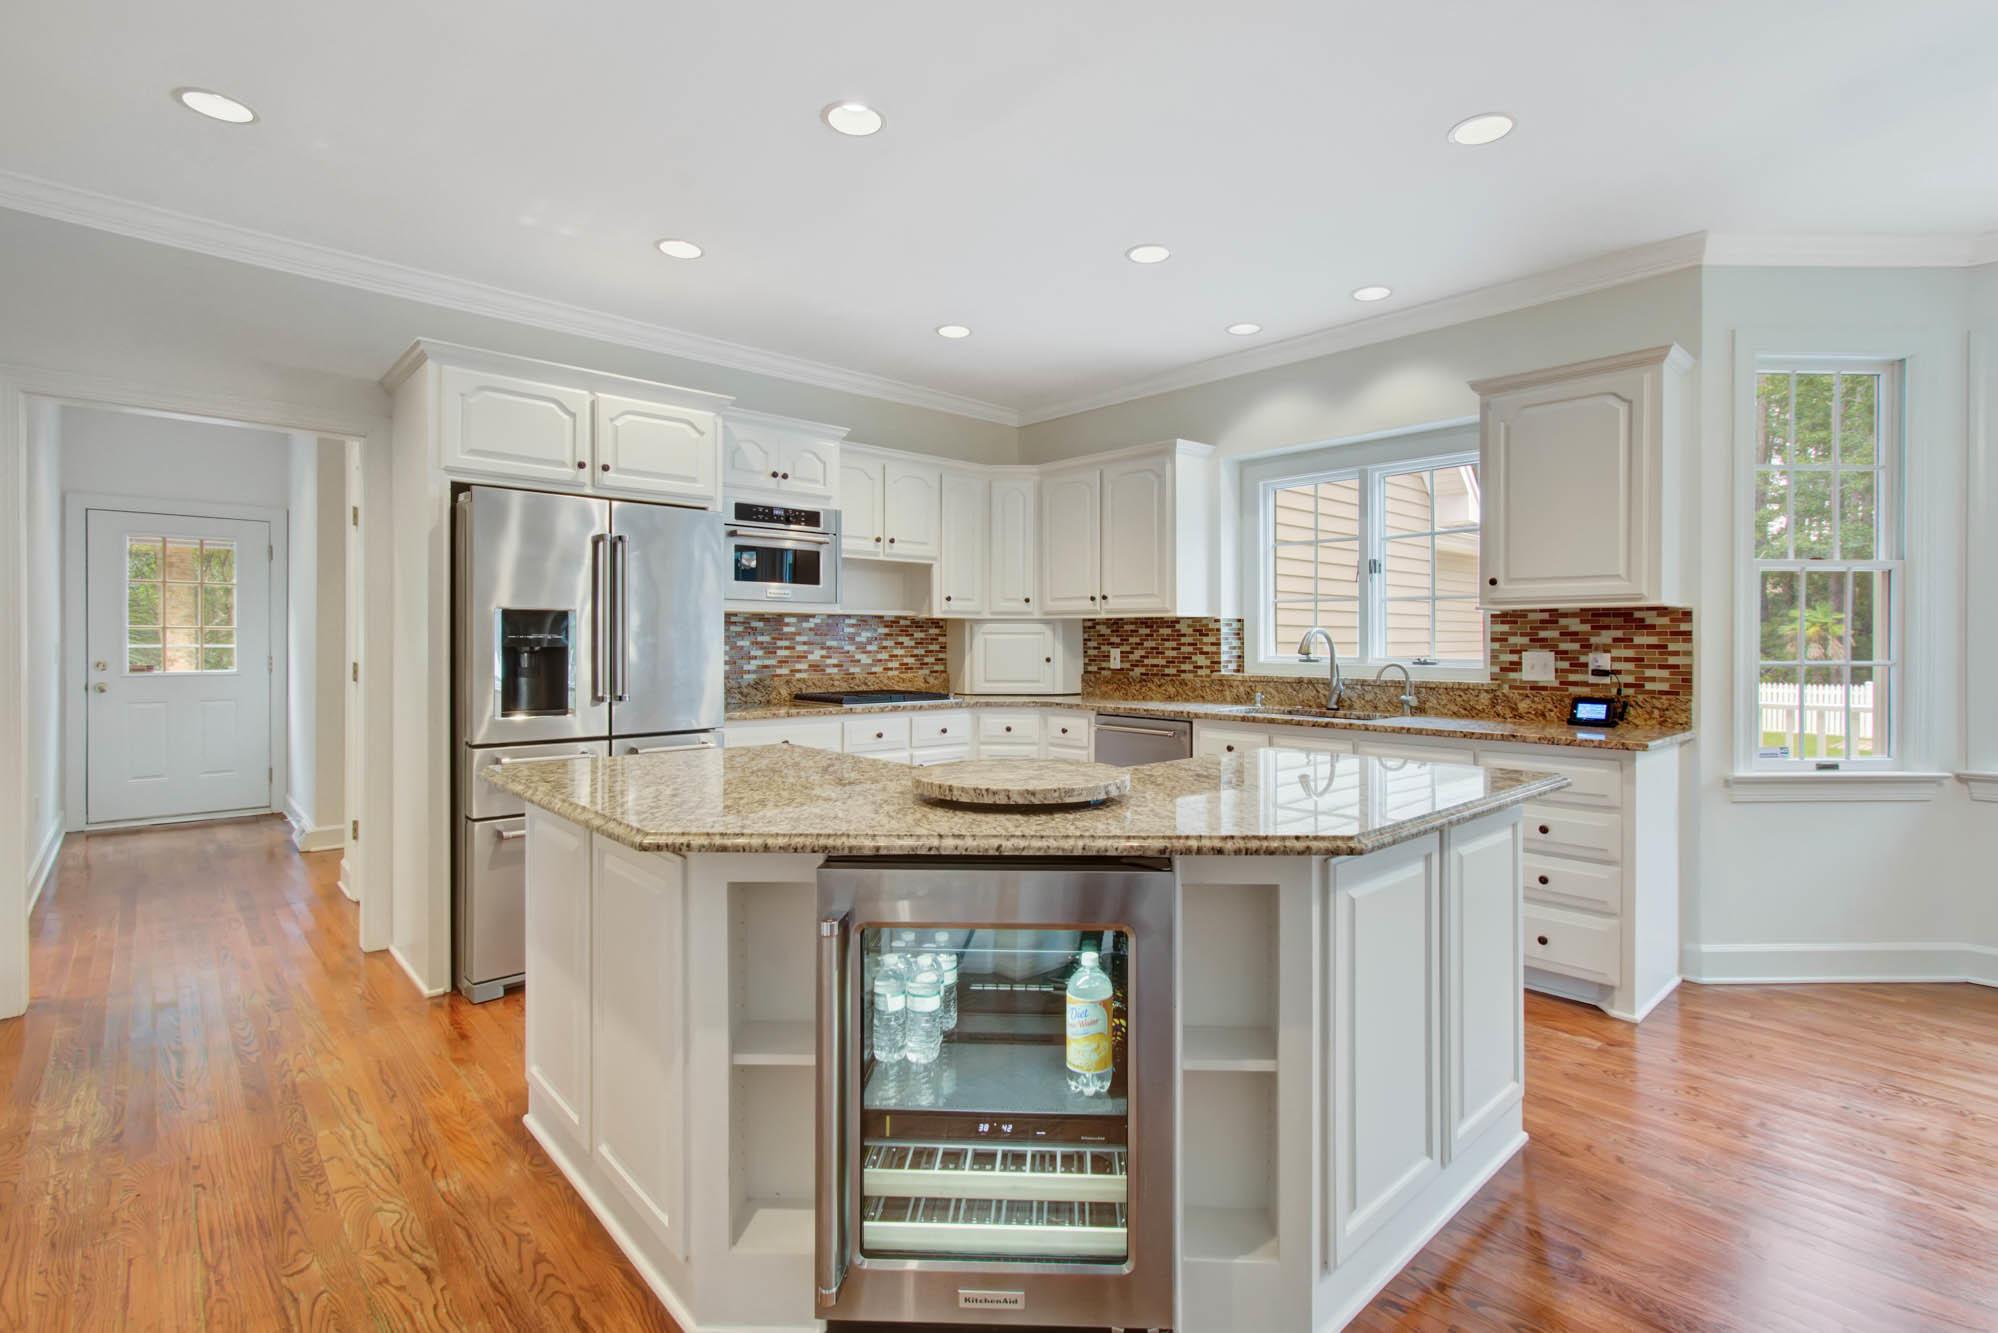 Dunes West Homes For Sale - 3515 Colonel Vanderhorst, Mount Pleasant, SC - 43